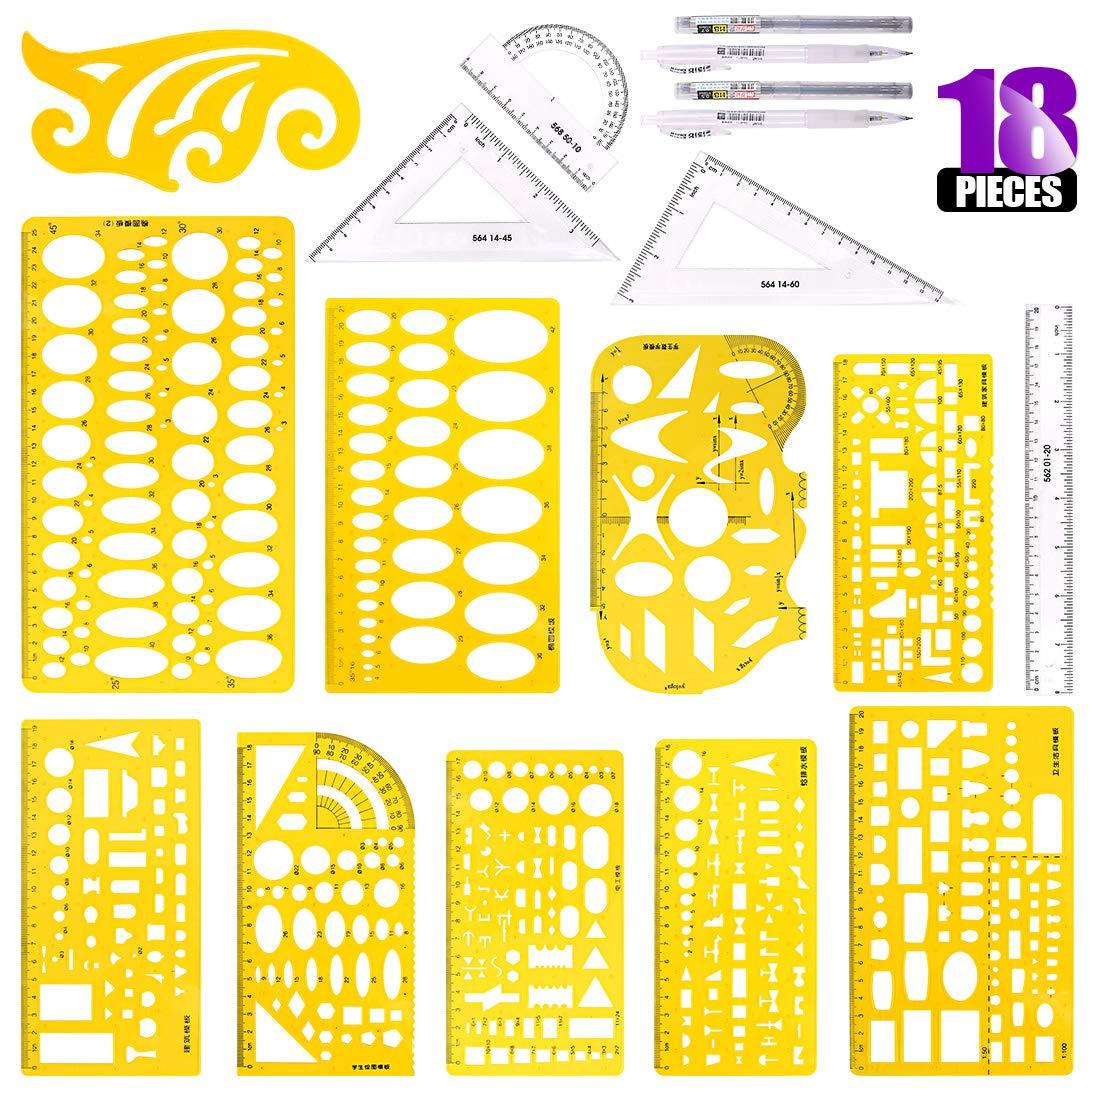 Swpeet 18Pcs Plastic Yellow Geometric Drawings Templates Kit, 10 Different Geometric Measuring Drawings Templates Stencils with 2Pcs Pencil and 5Pcs Measuring Ruler for Drawing Engineering Drafting by Swpeet